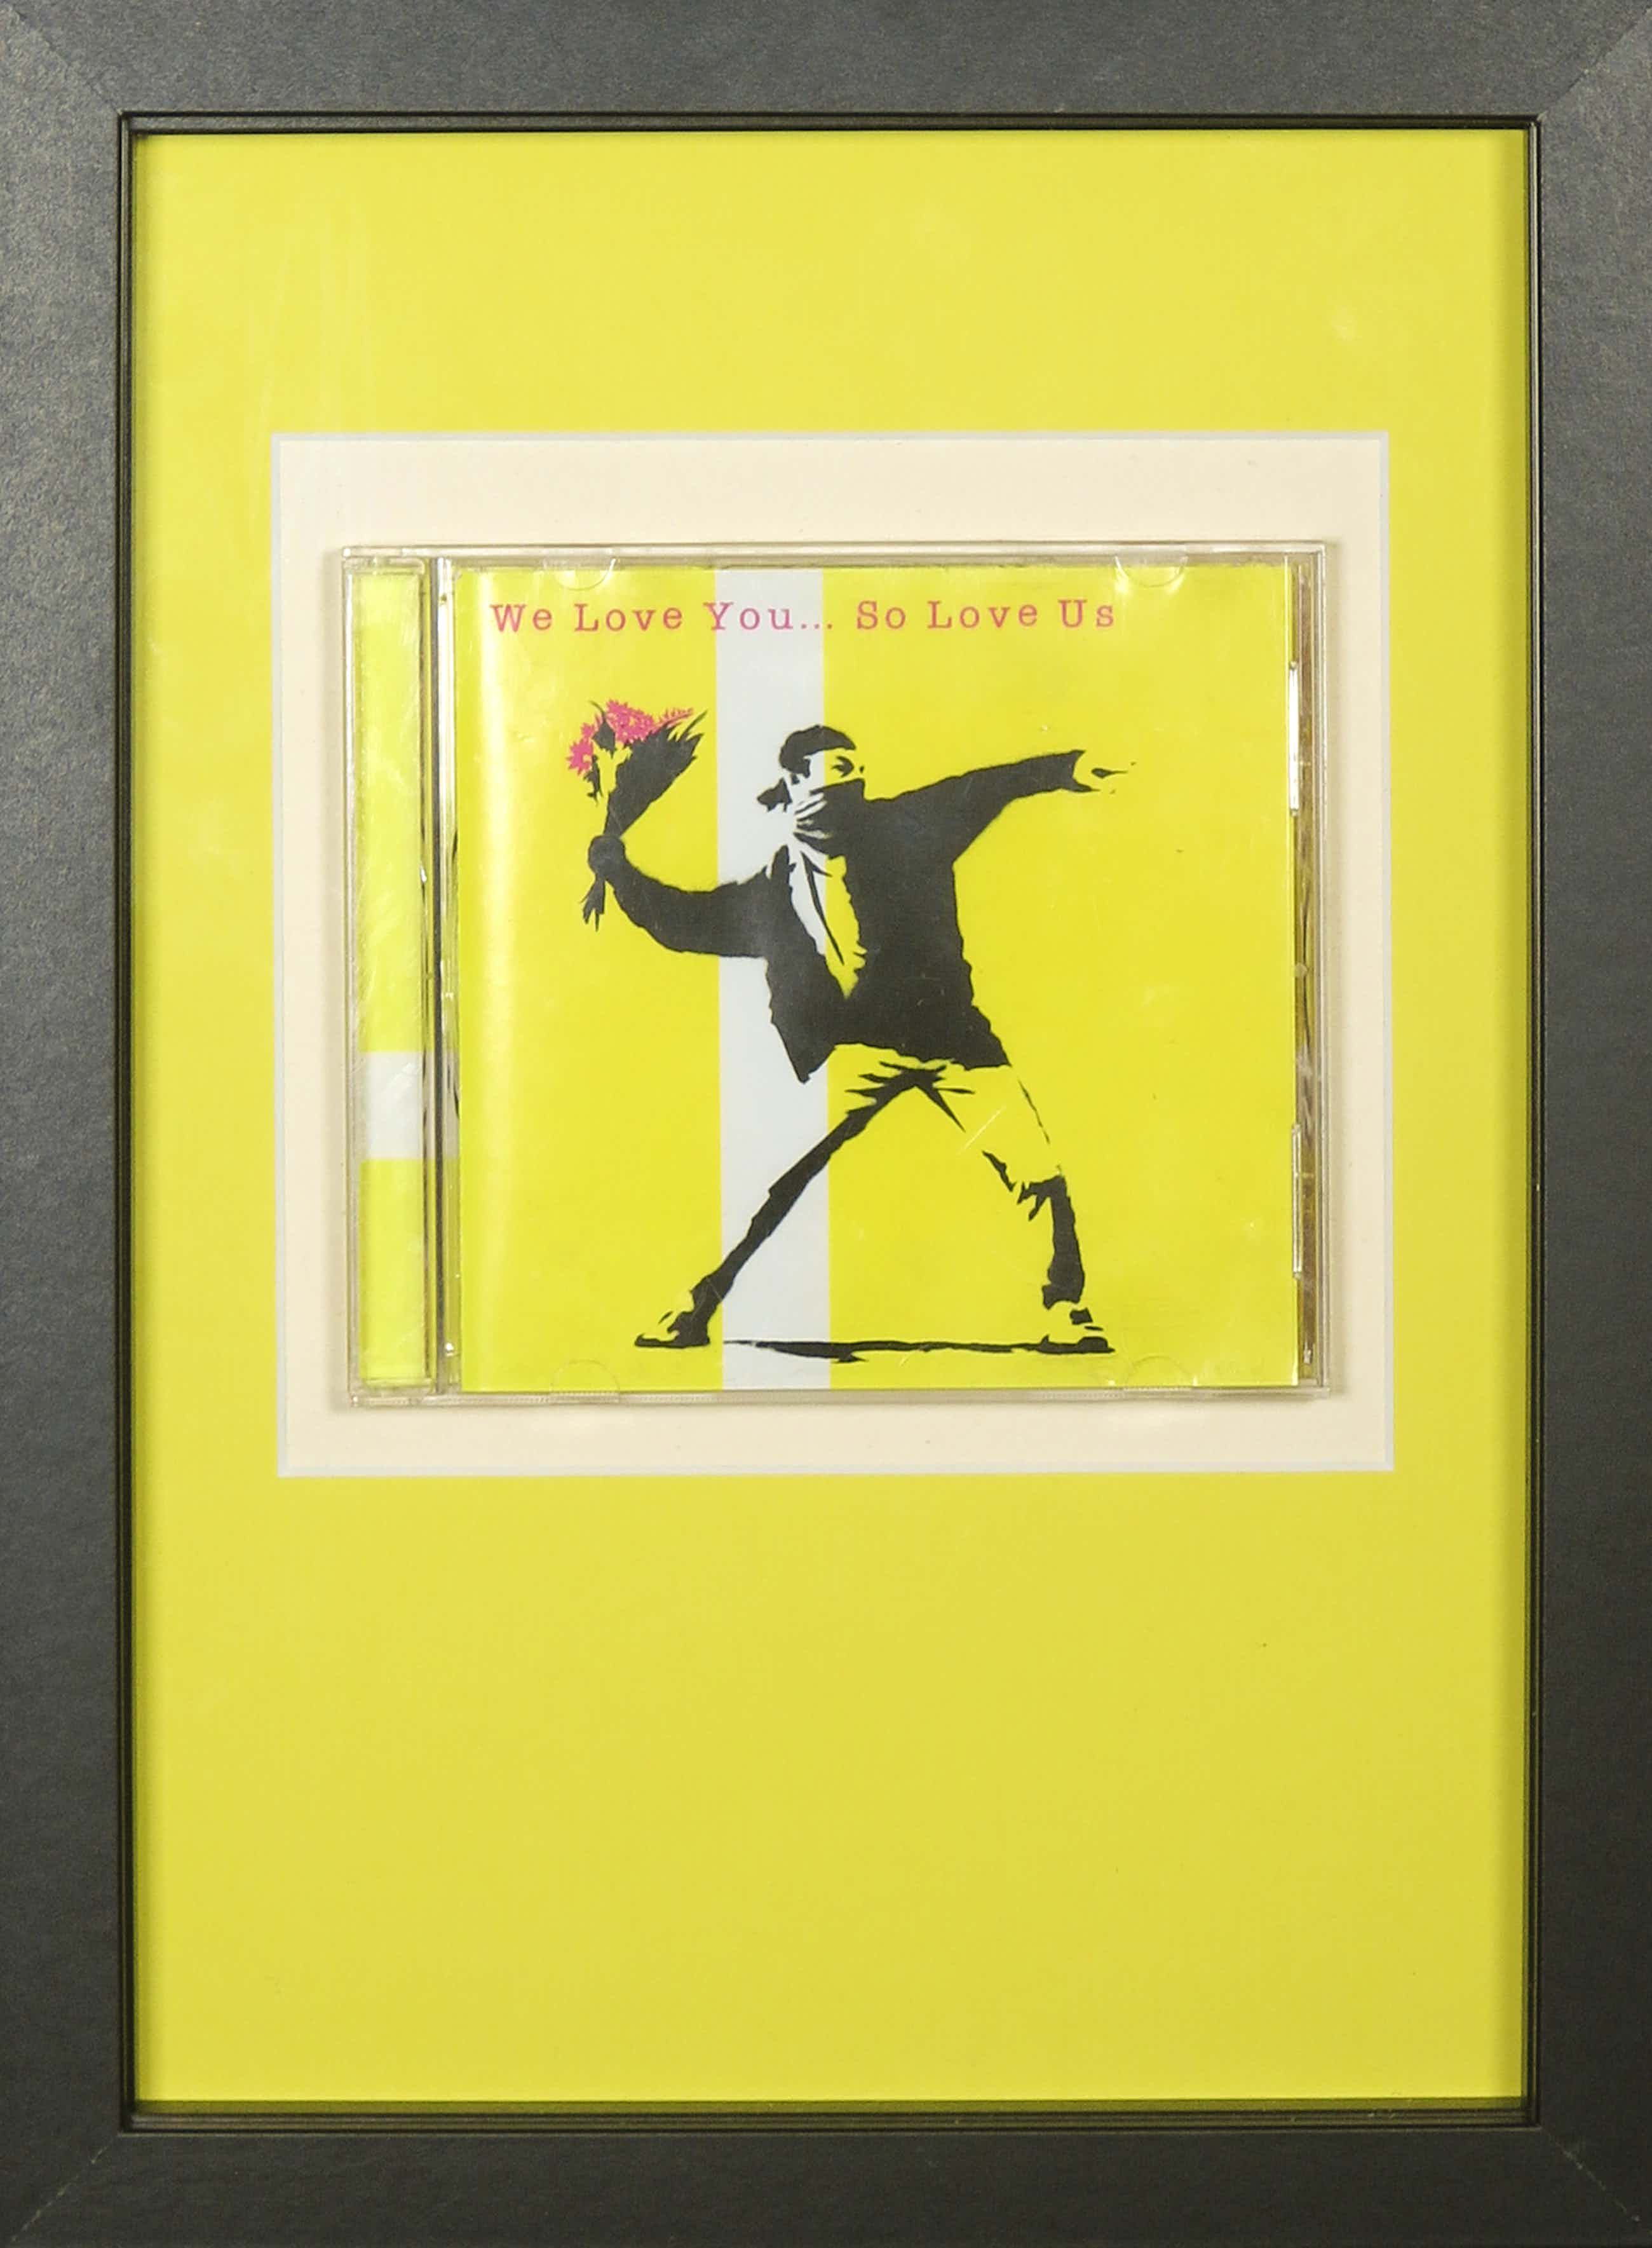 Banksy - We love you... so love us (CD) - Ingelijst kopen? Bied vanaf 156!